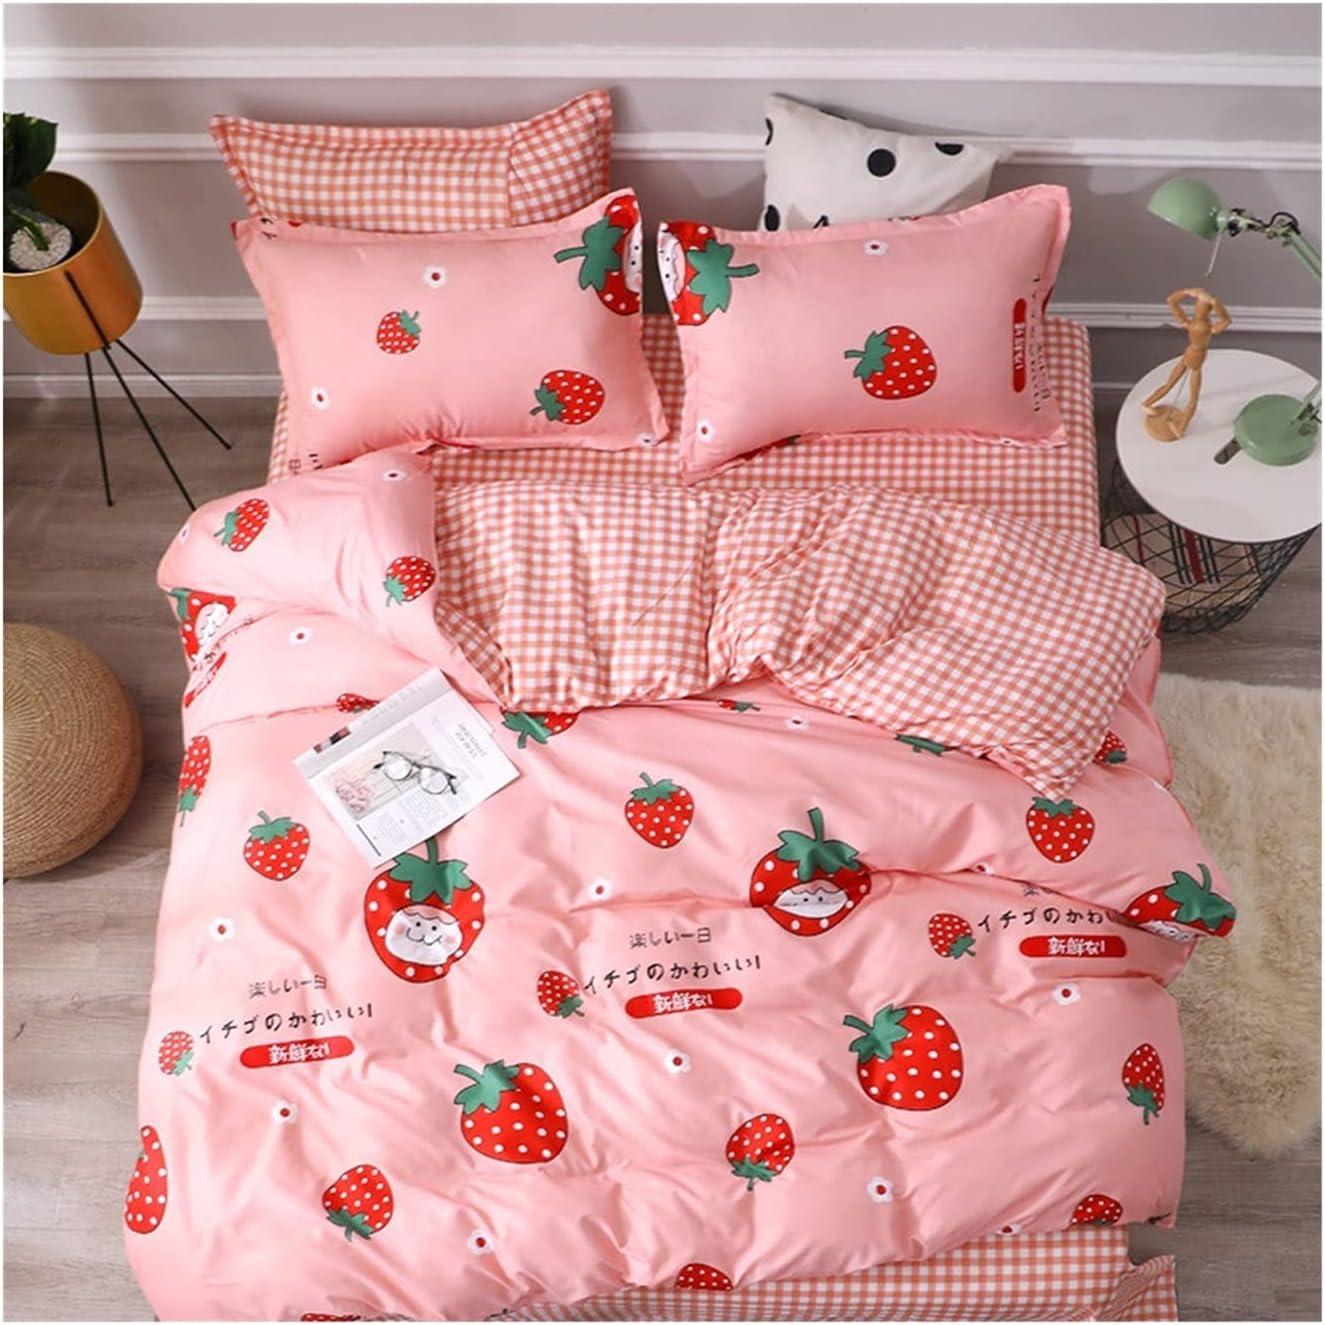 LSDJ QMDSH Home Wholesale Textile Girl Bedding Cover Pink Set Peach Duvet Raleigh Mall